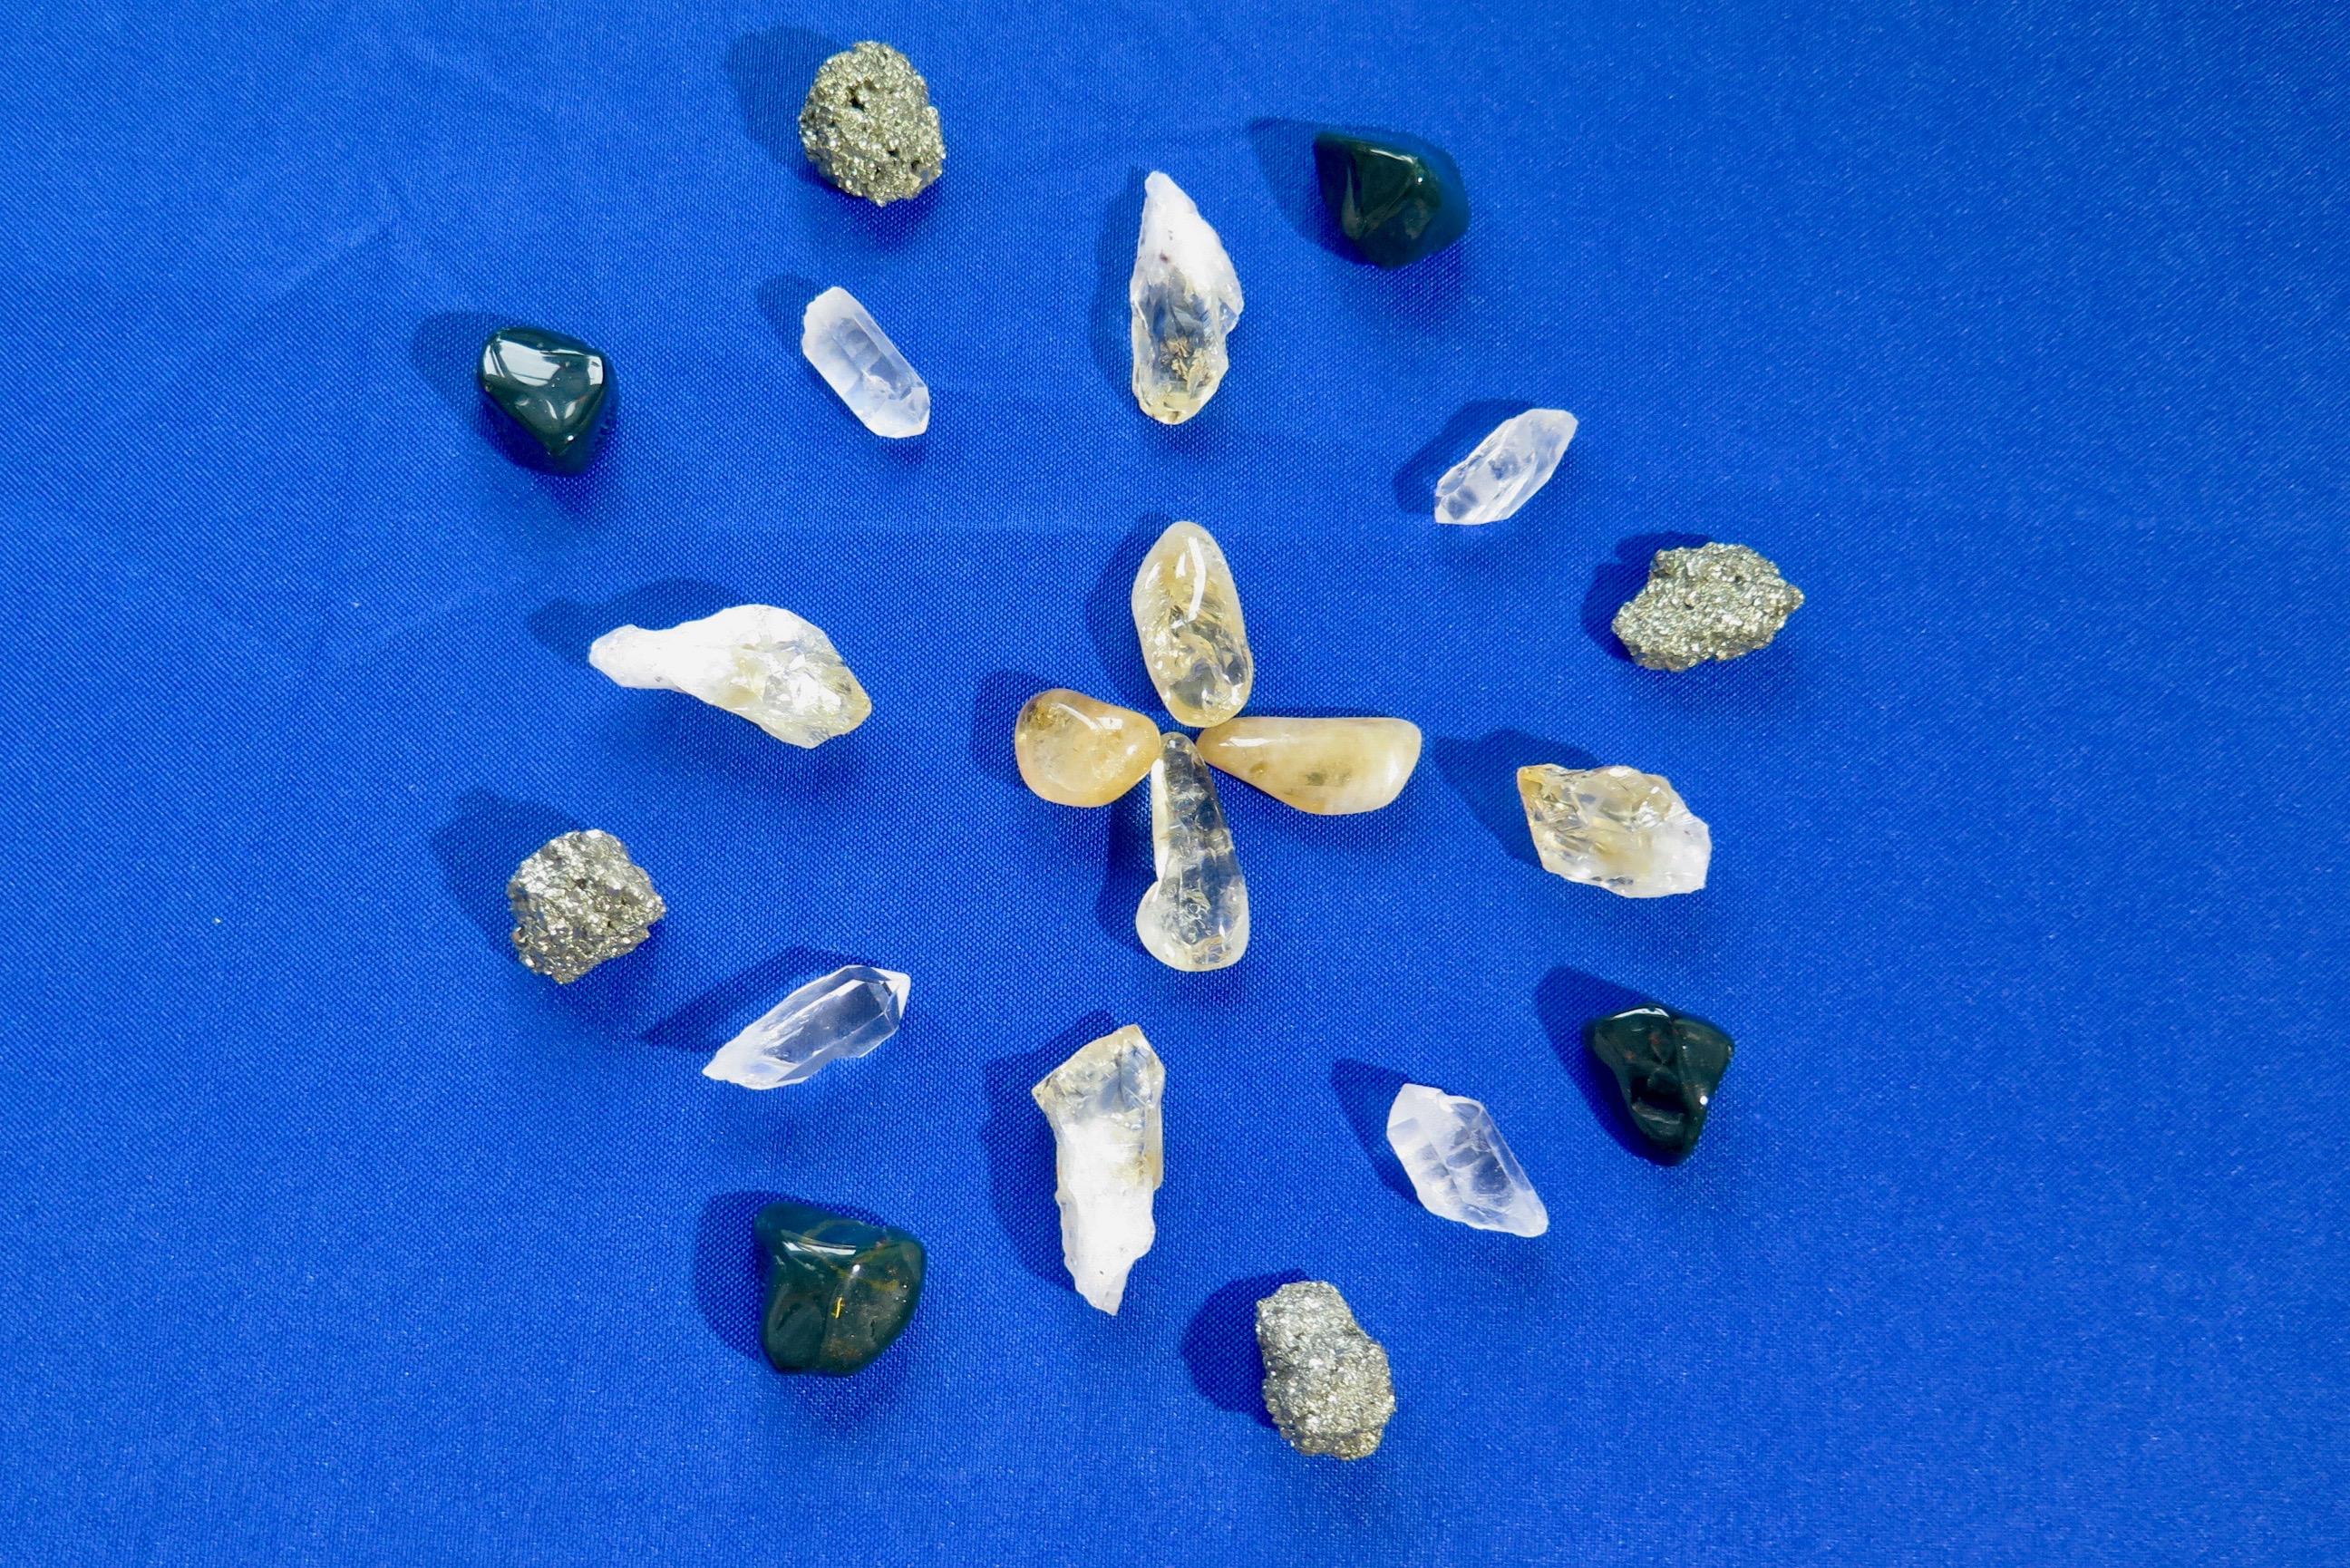 Crystal Grid: Liz Clark: LizianEvents Ltd